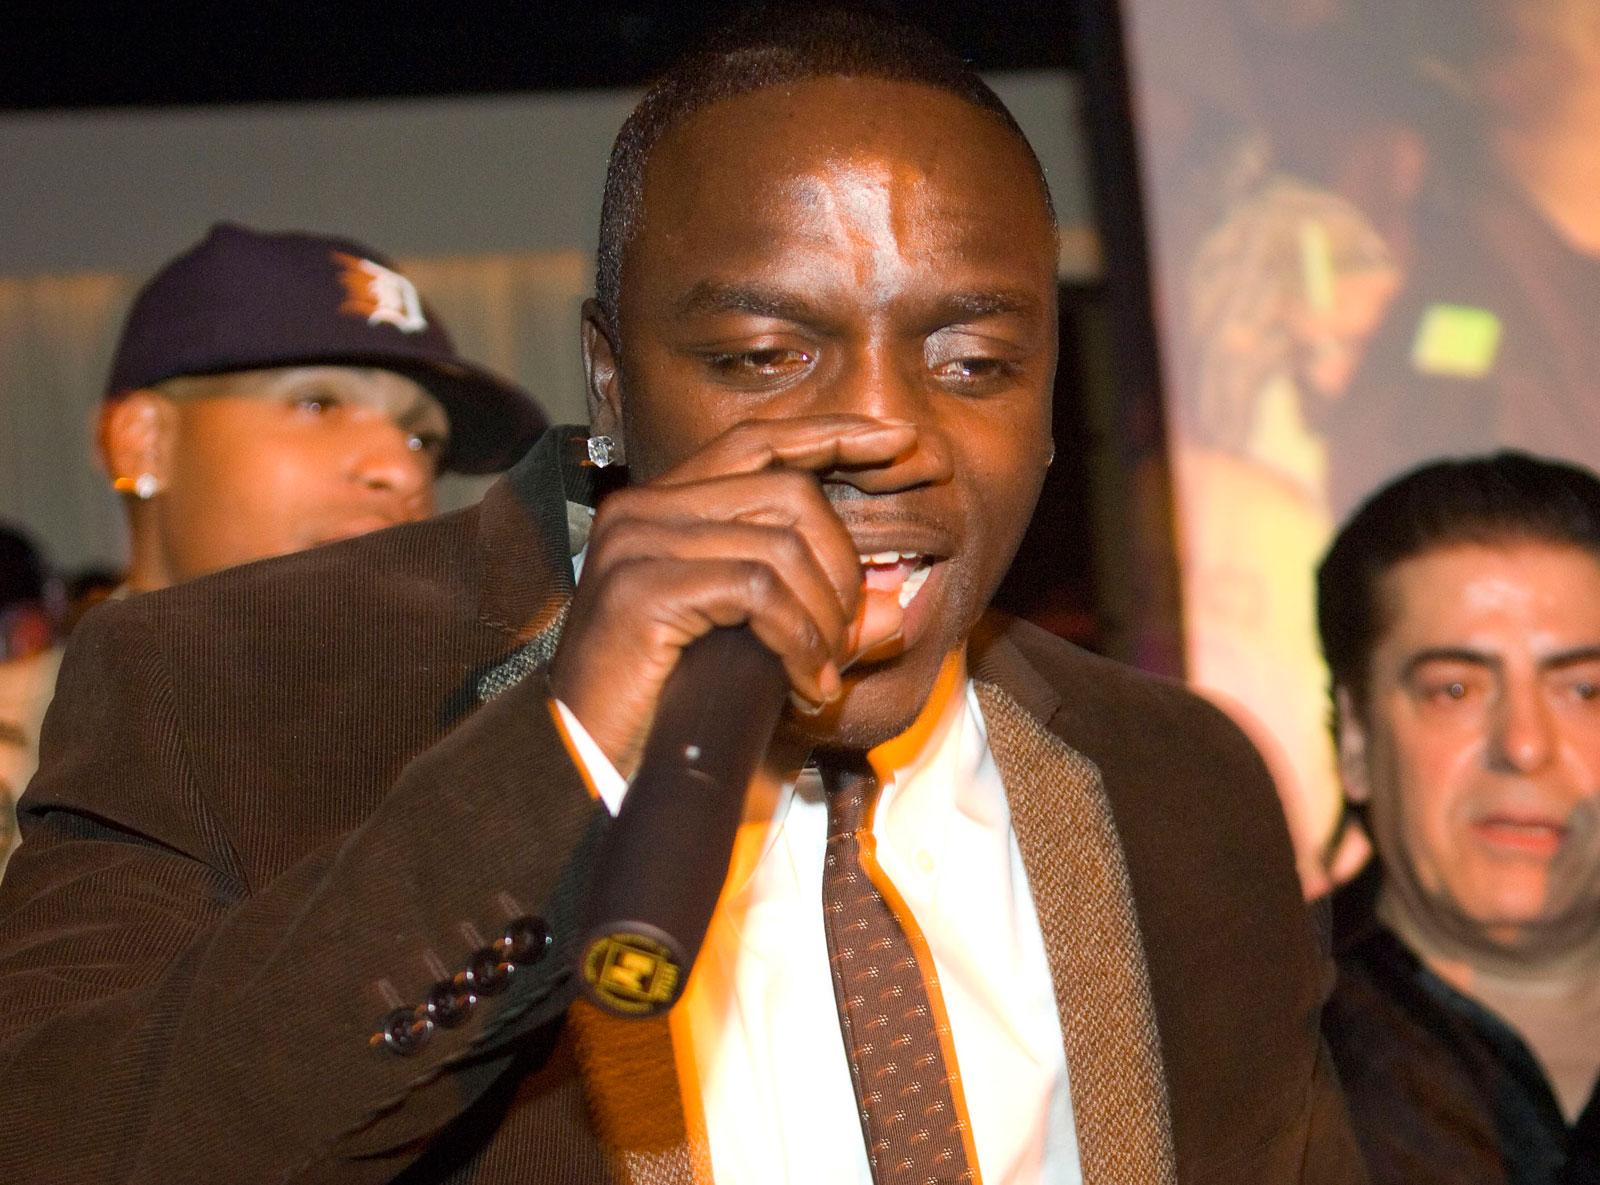 akon biography Akon net worth is estimated at $80 million he was born aliaune damala bouga time bongo puru nacka lu lu lu badara akon thiam akon is a american r&b recording artist, businessman and songwriter akon net worth came from his work as a recording artist, businessman and songwriter however, he is .